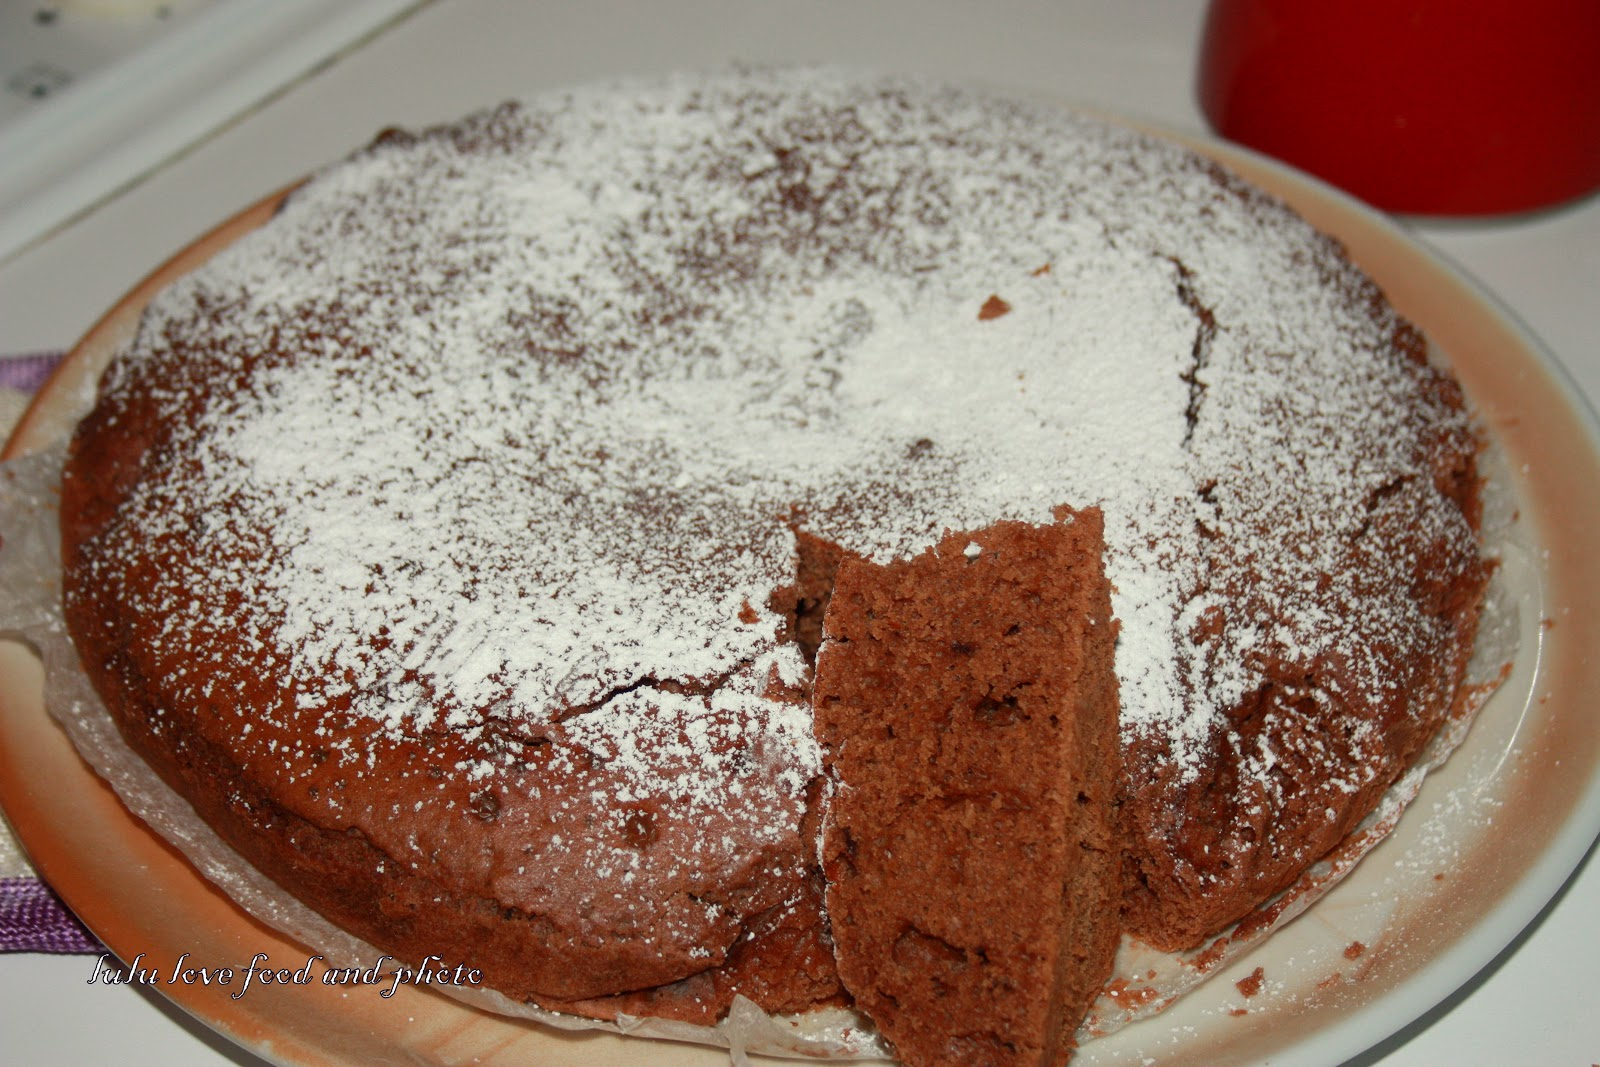 Per te realizuar kete torte tipike mengjesore, u mundova ti reduktoja ...